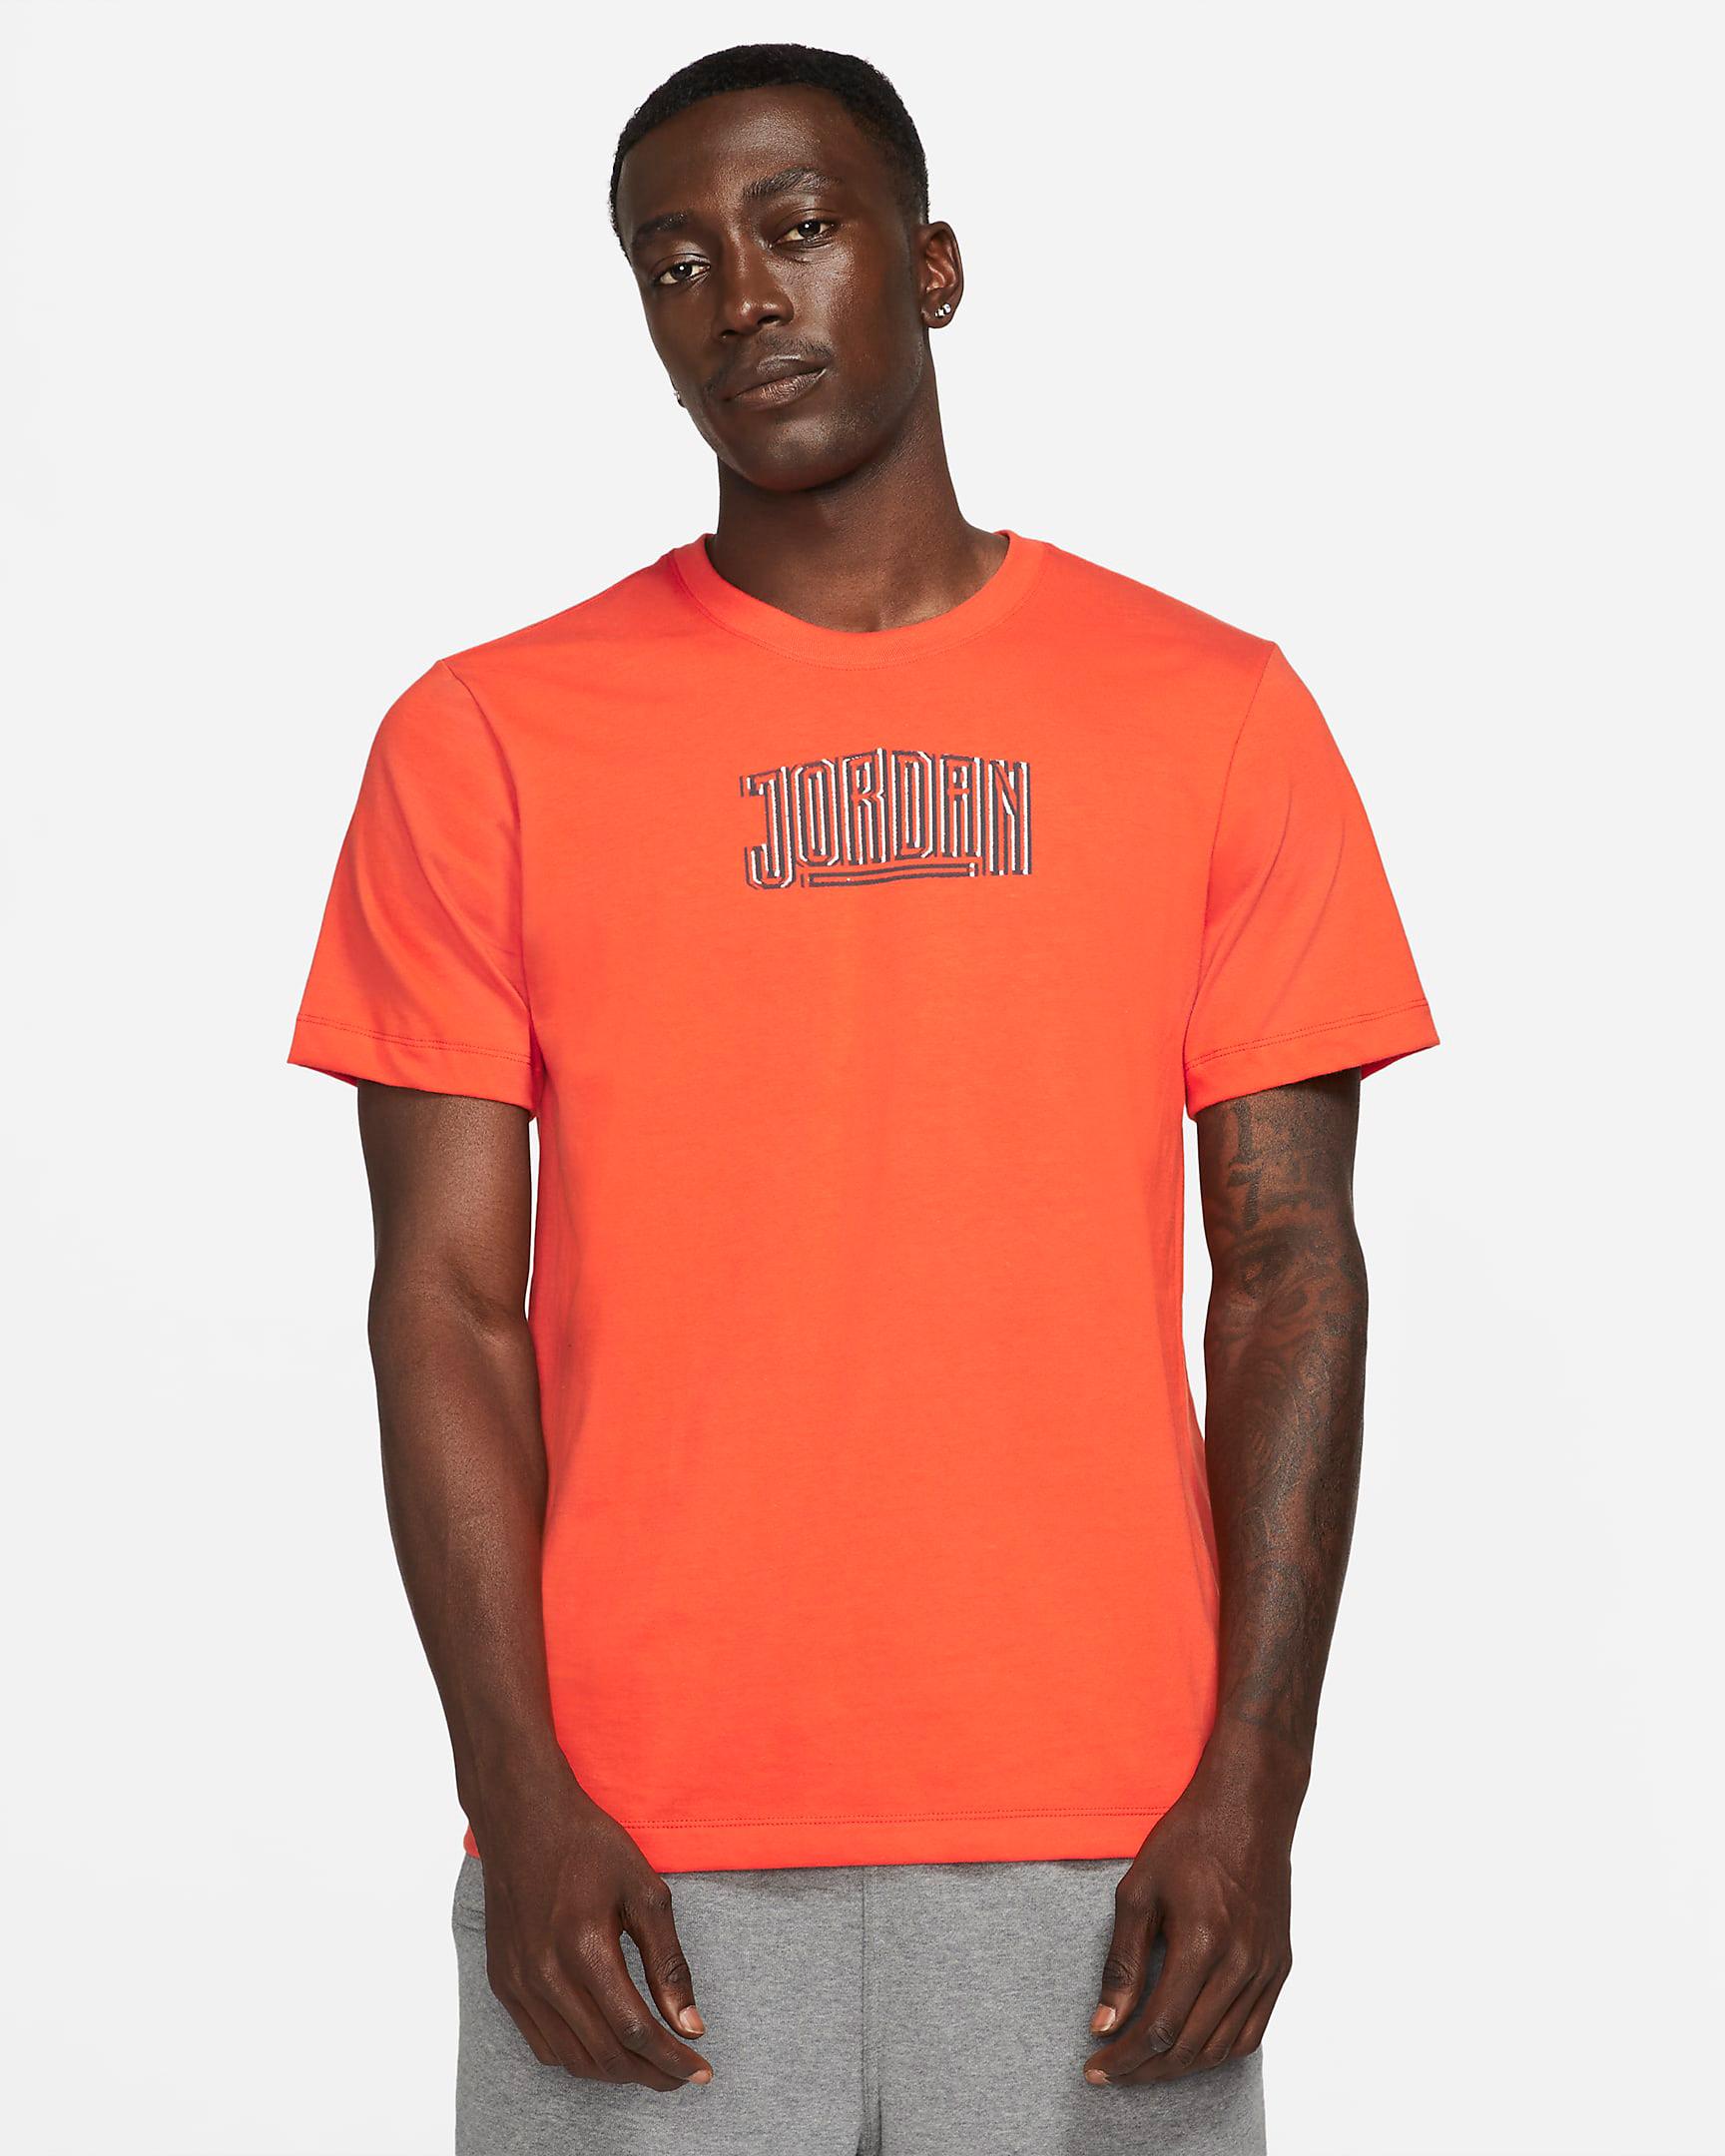 air-jordan-1-high-og-electro-orange-shirt-1